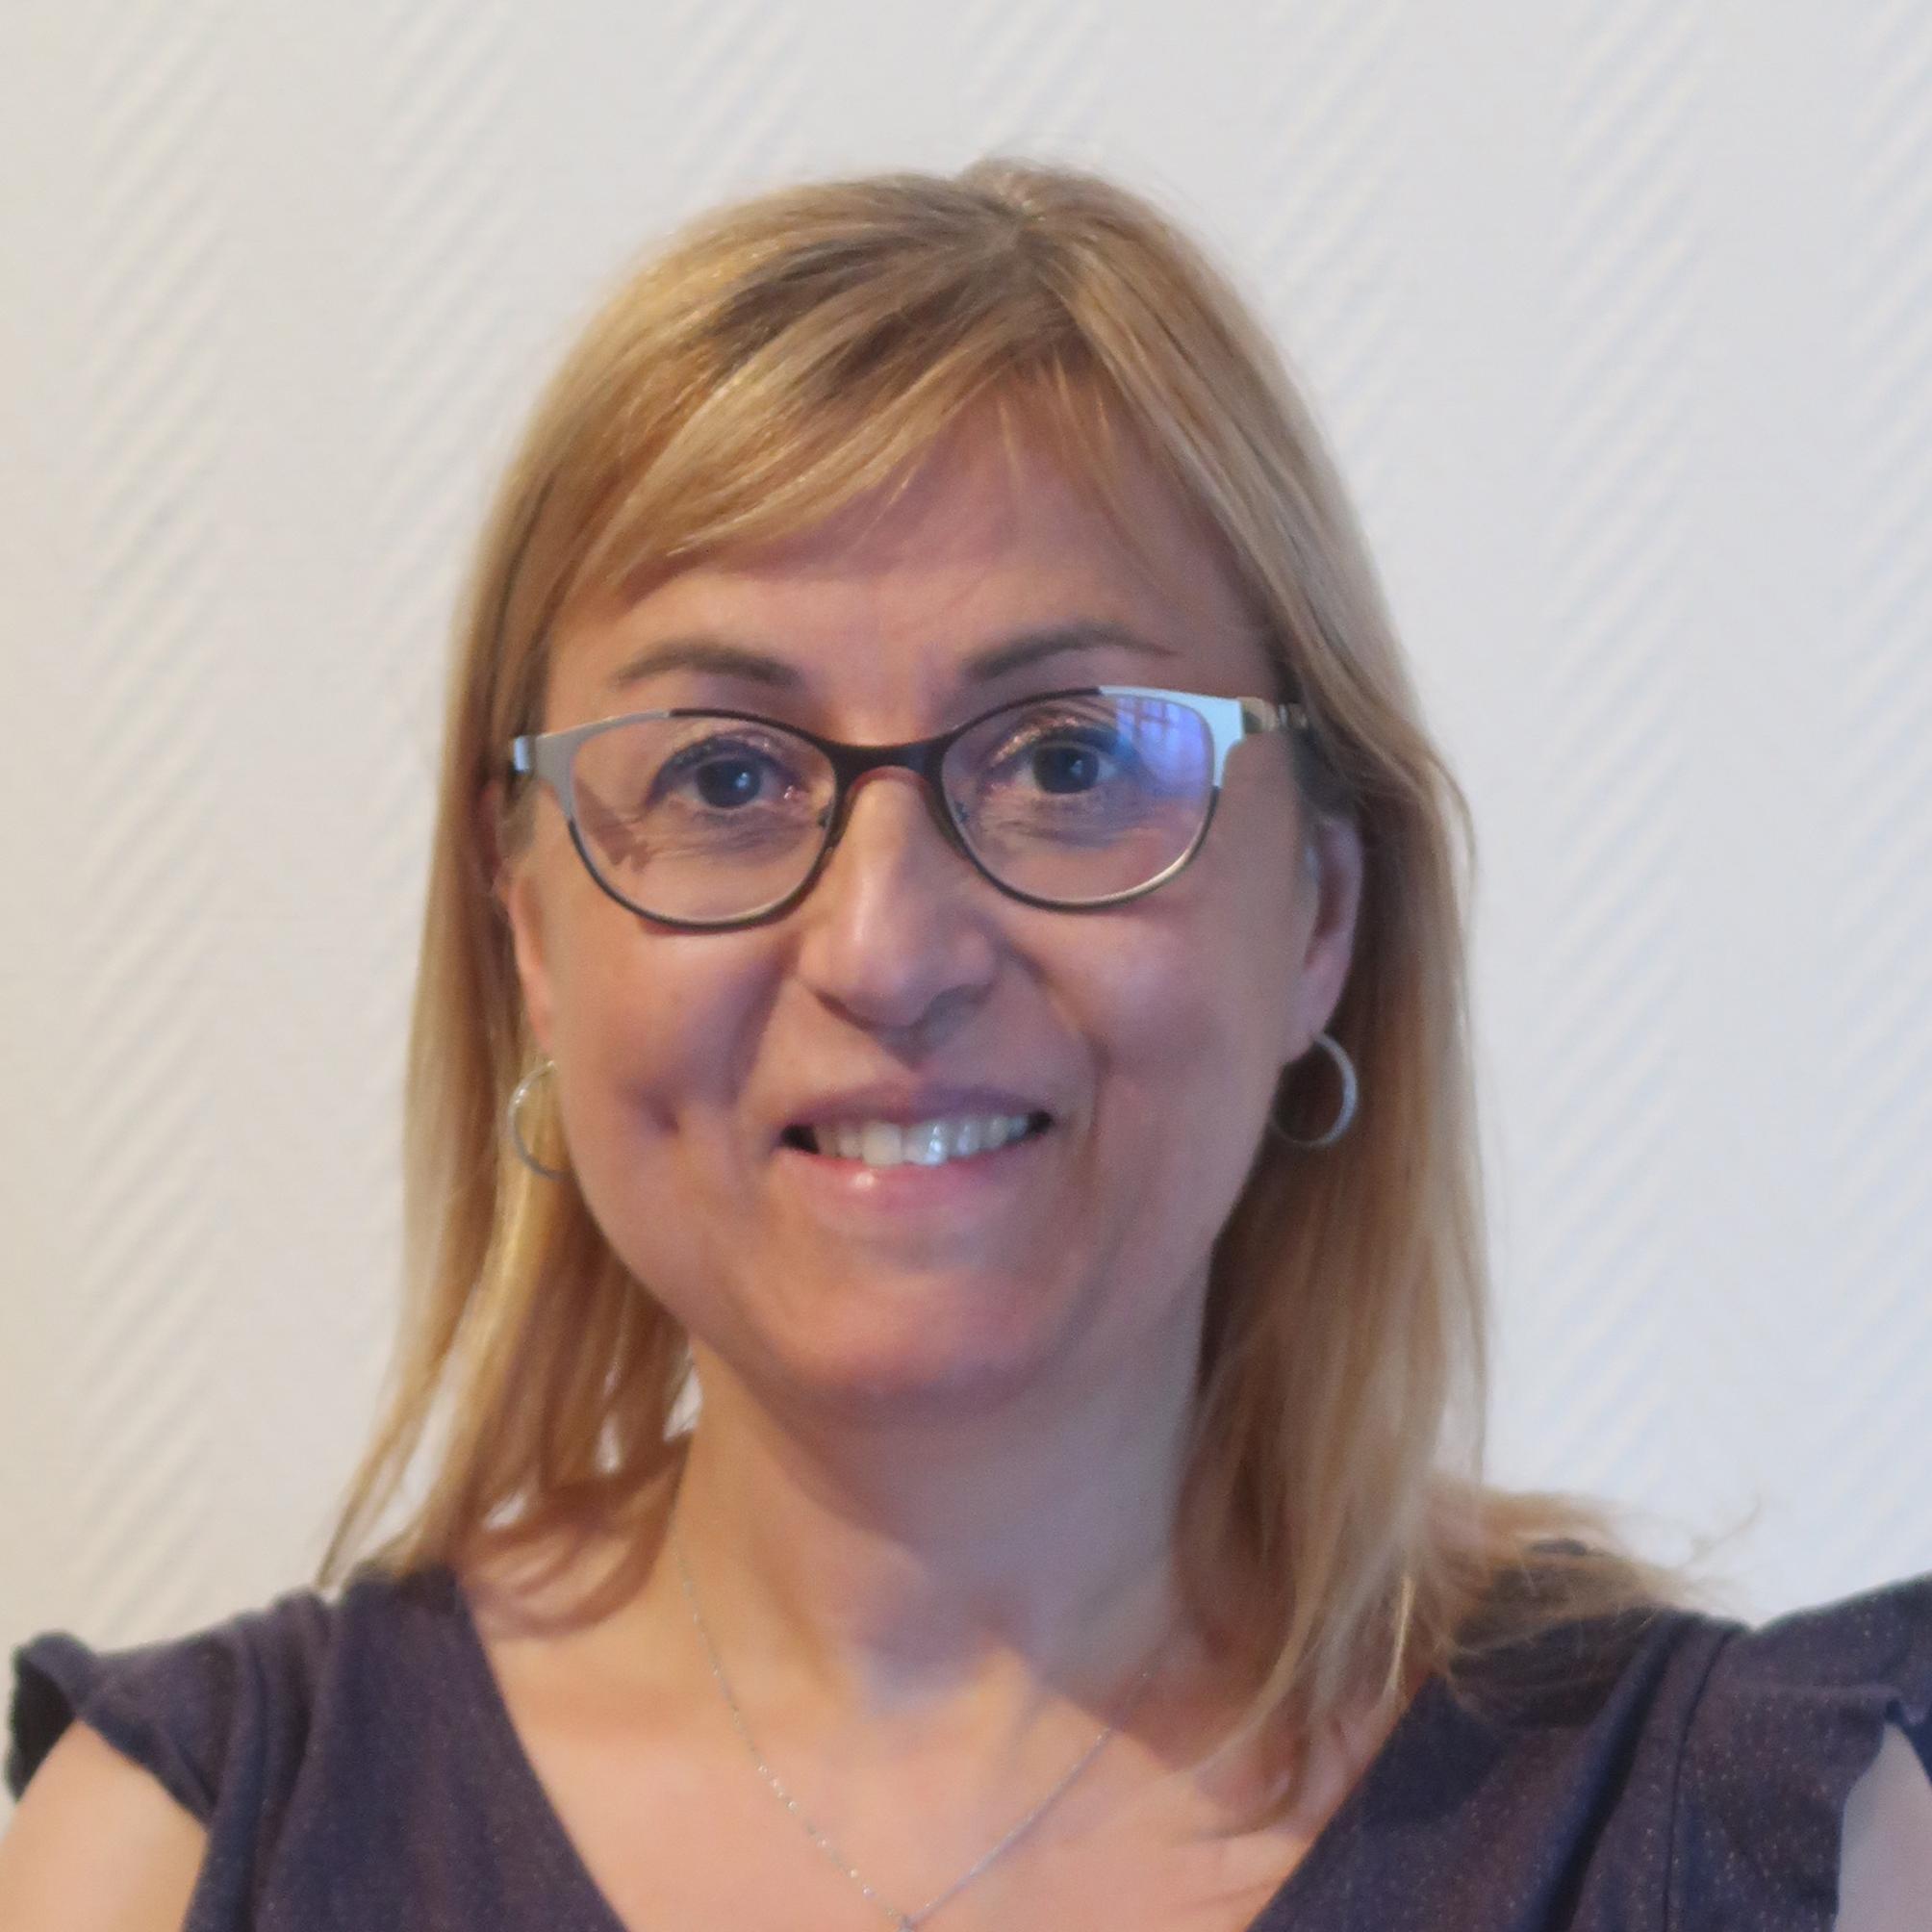 Nathalie Pruvost